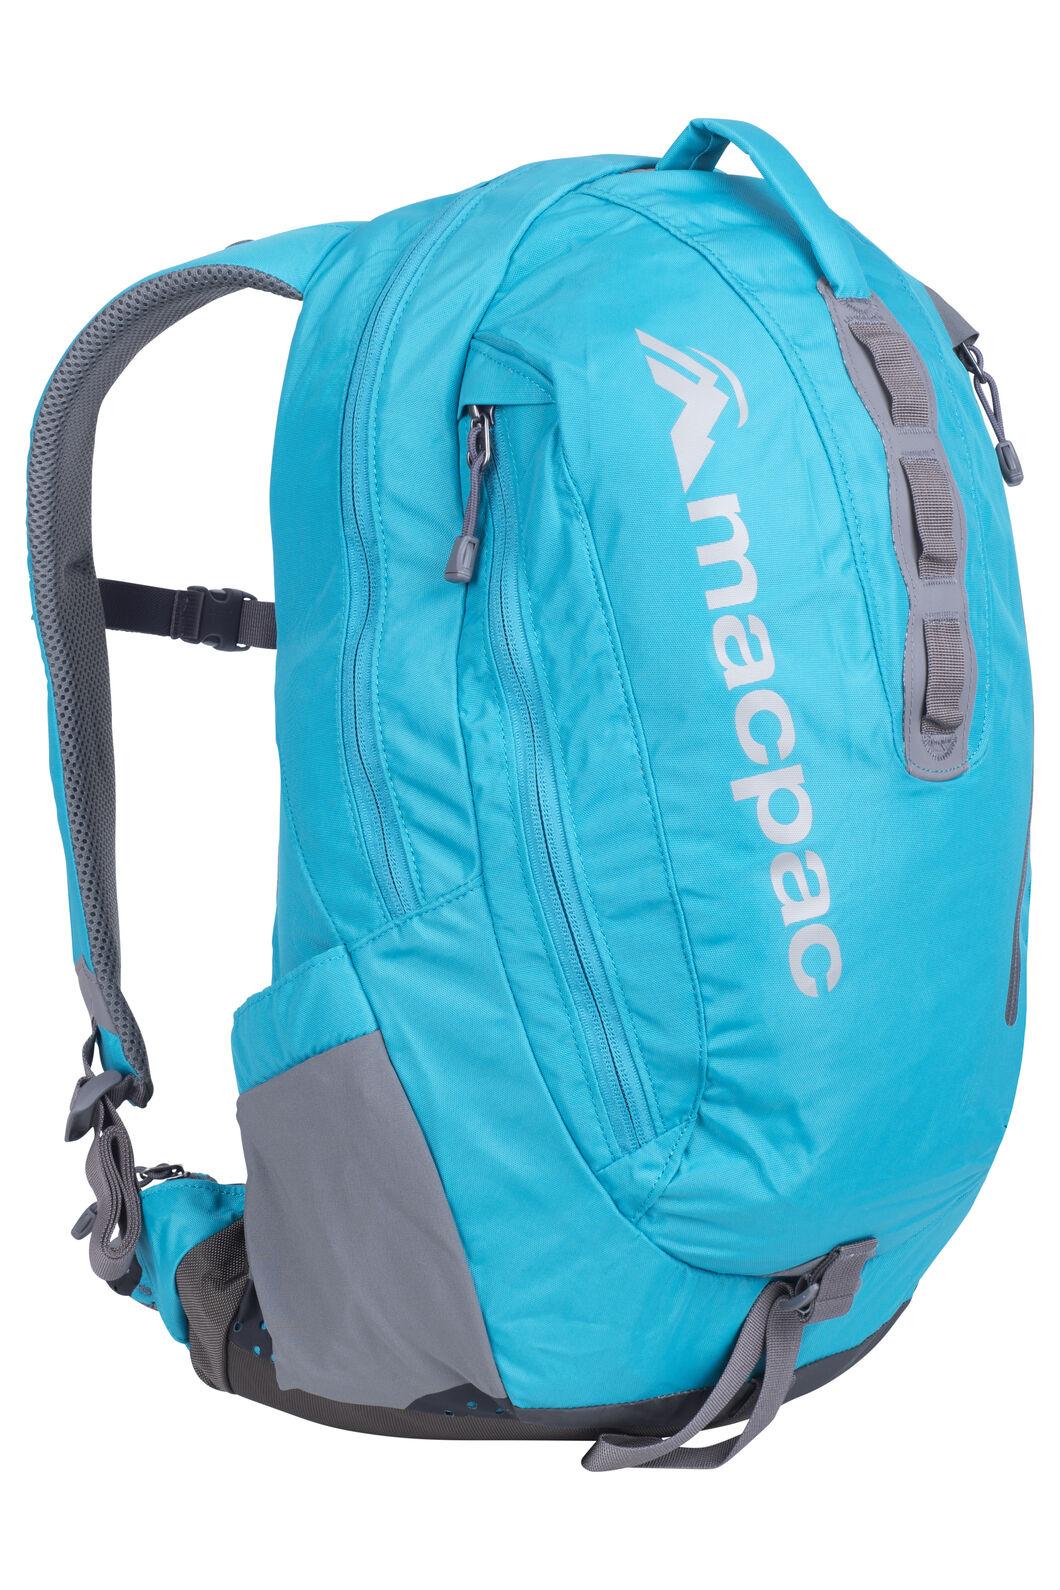 Macpac Rapaki 26L Daypack, Enamel Blue, hi-res